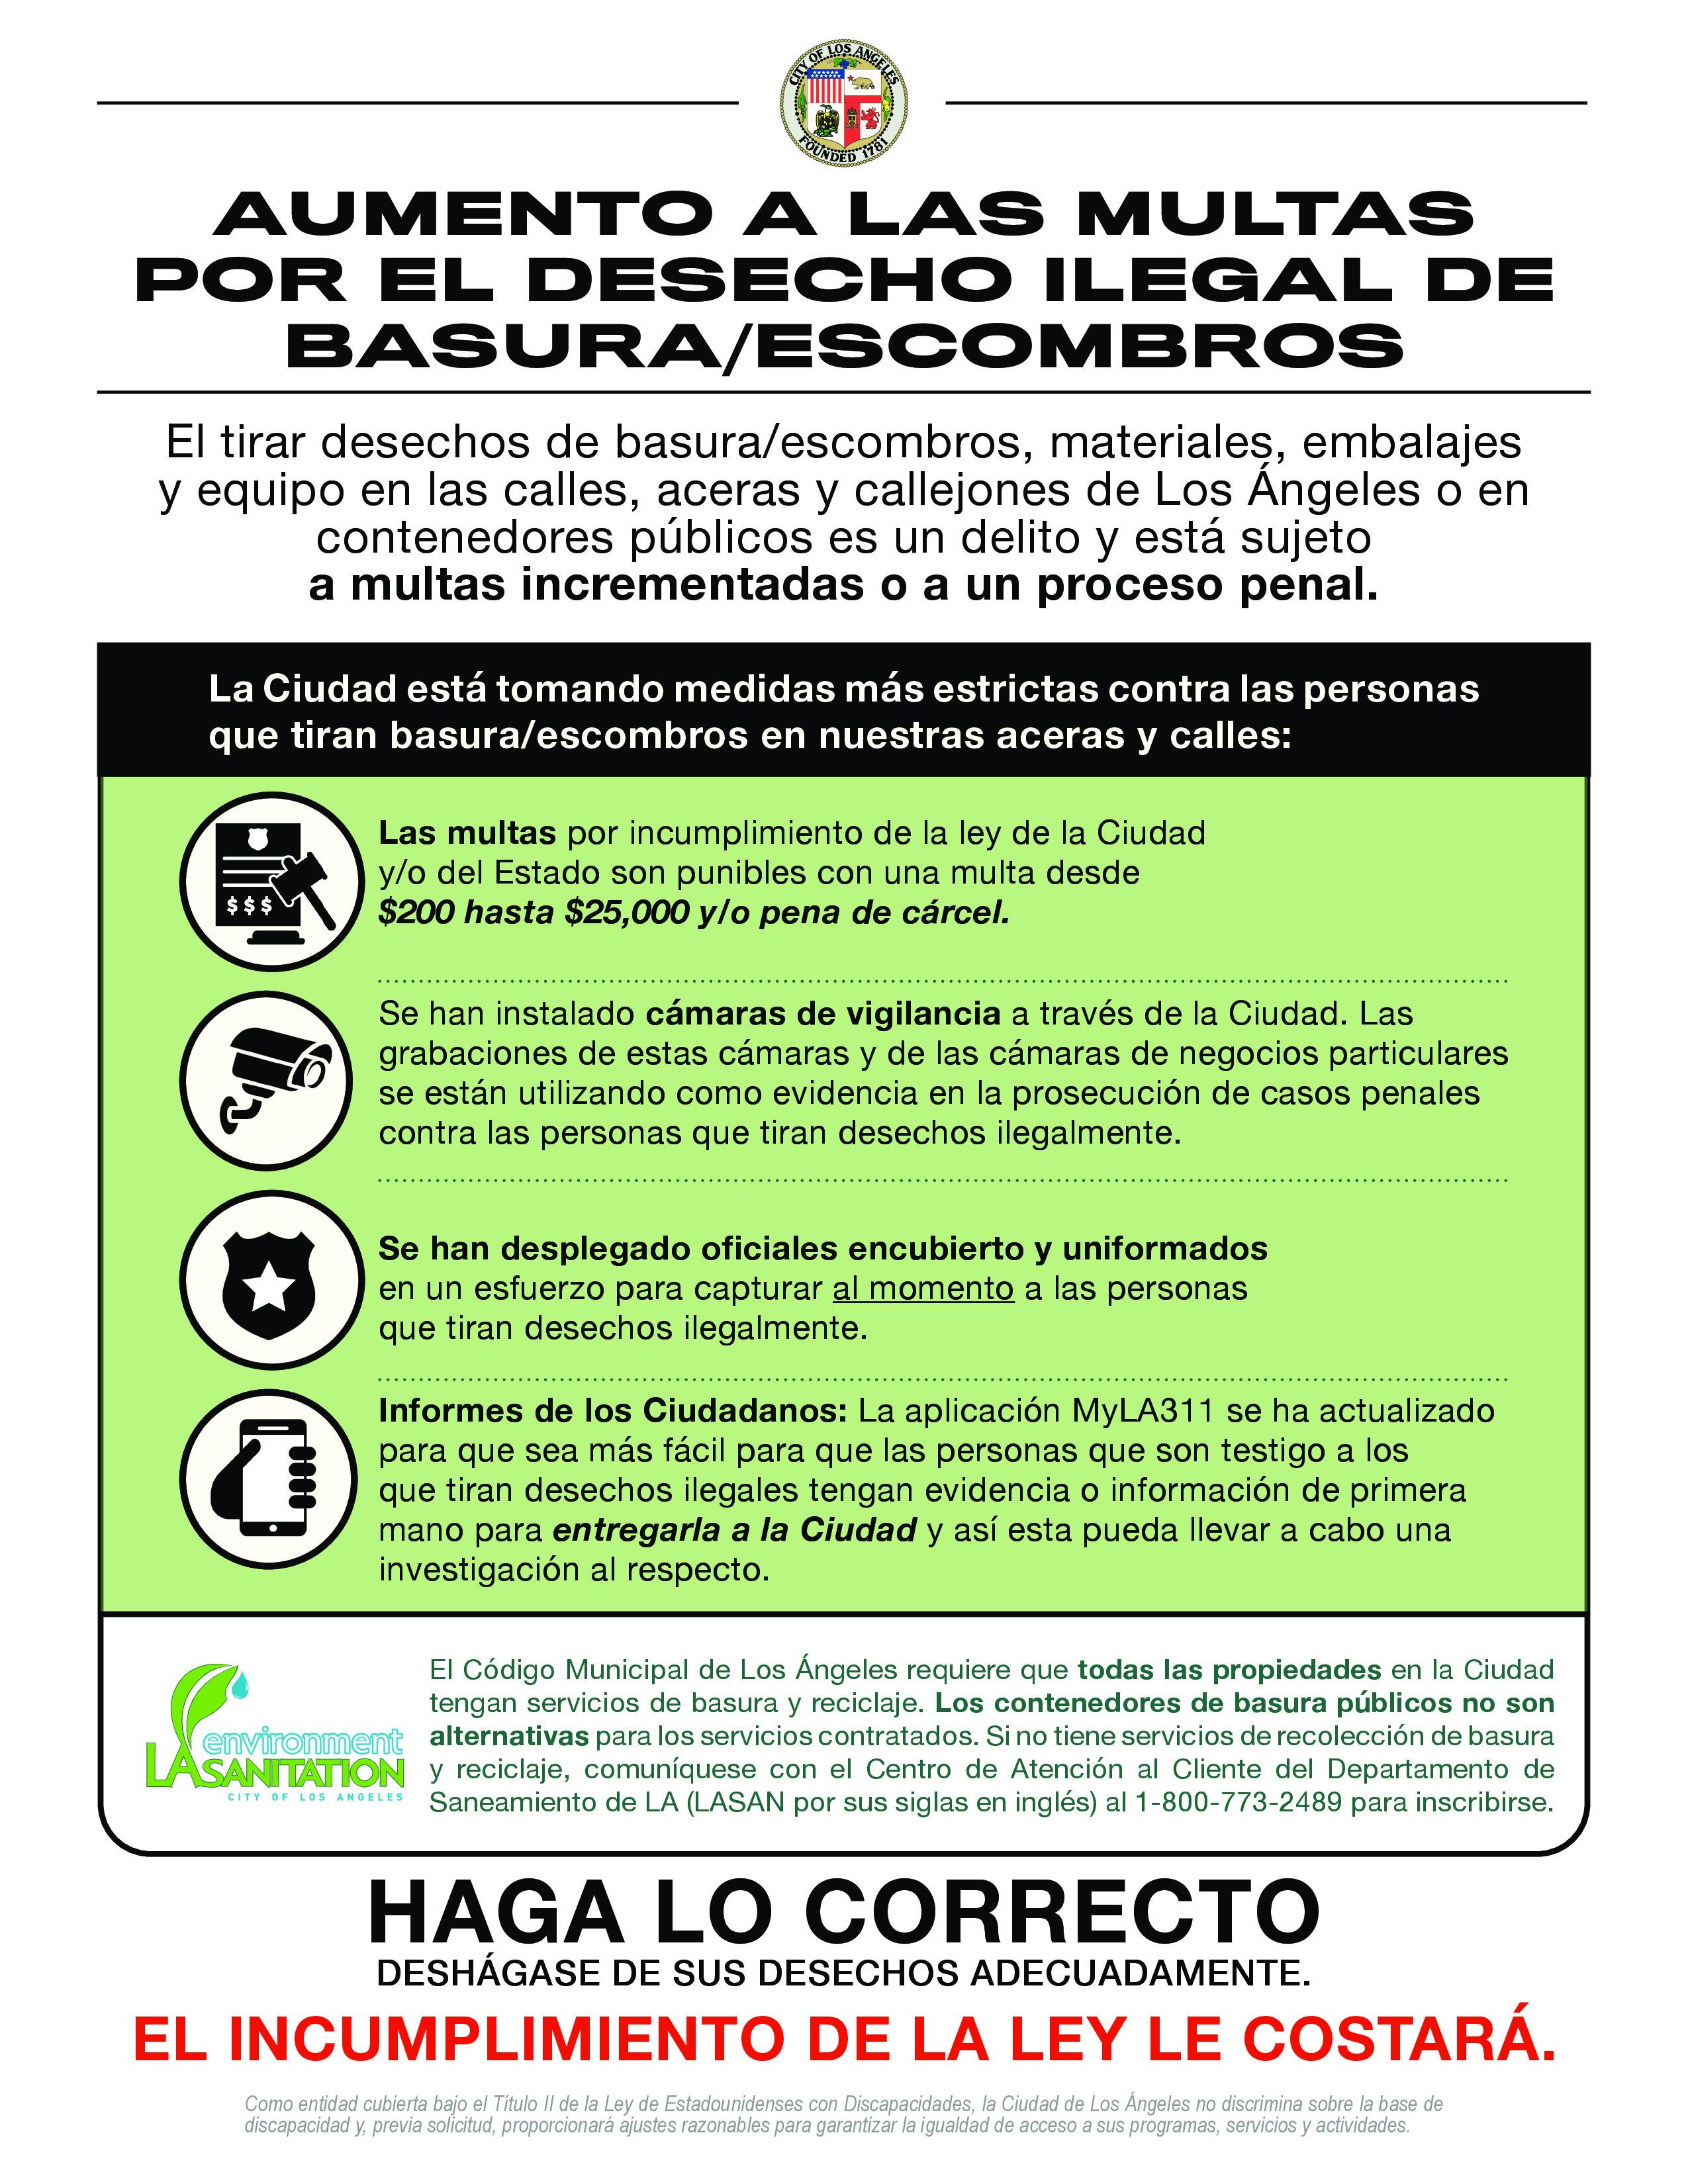 Illegal_Dumping_Flyer_V1_ENG_SPANISH-page-1.jpg